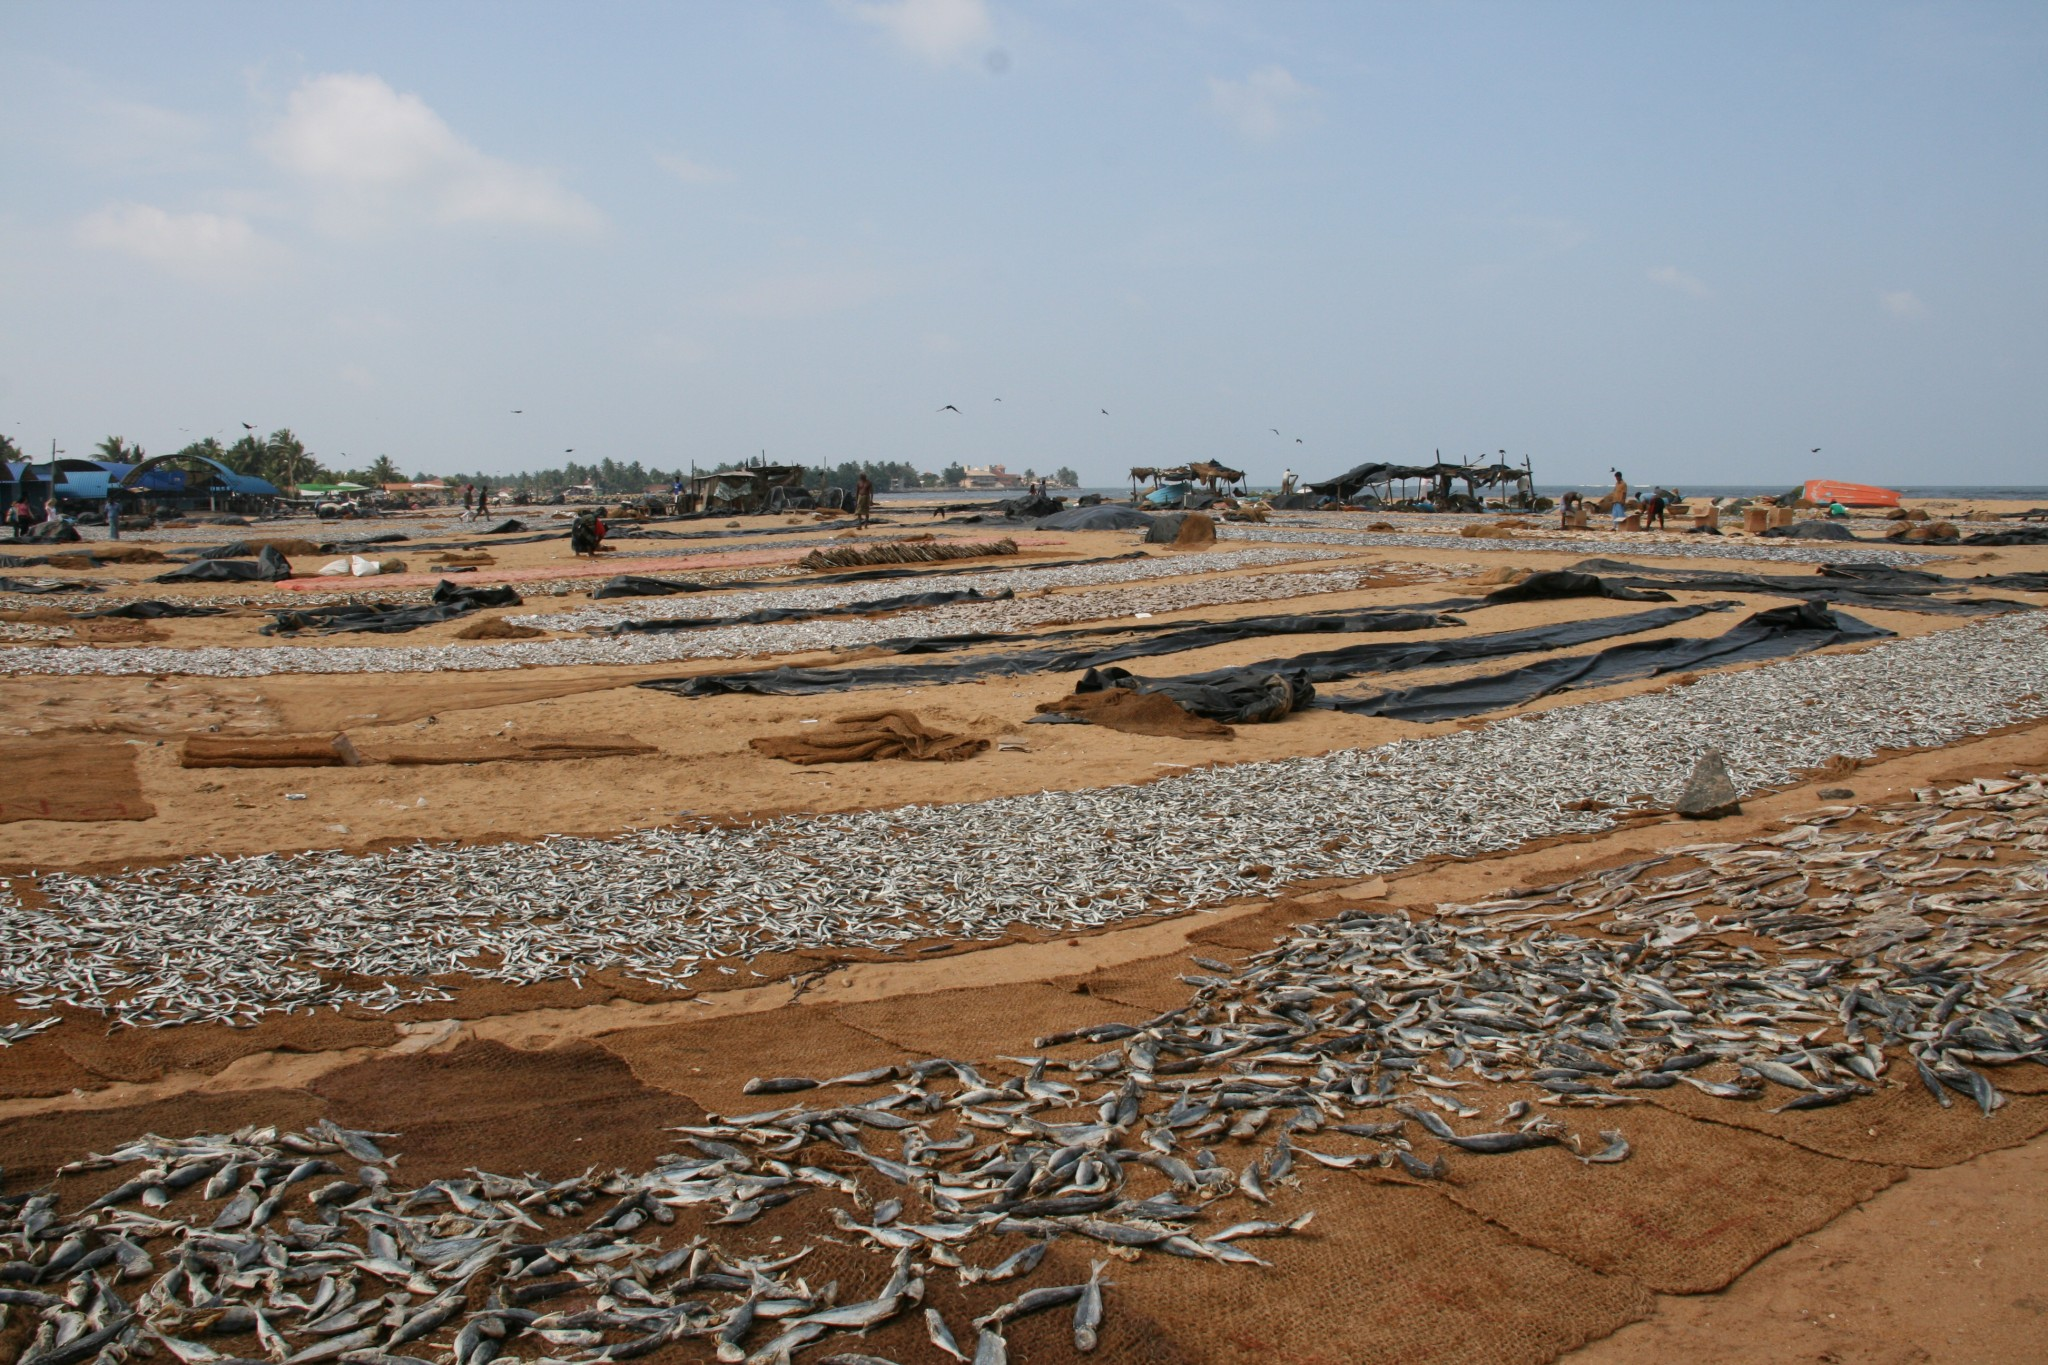 Poissons séchés à Negombo